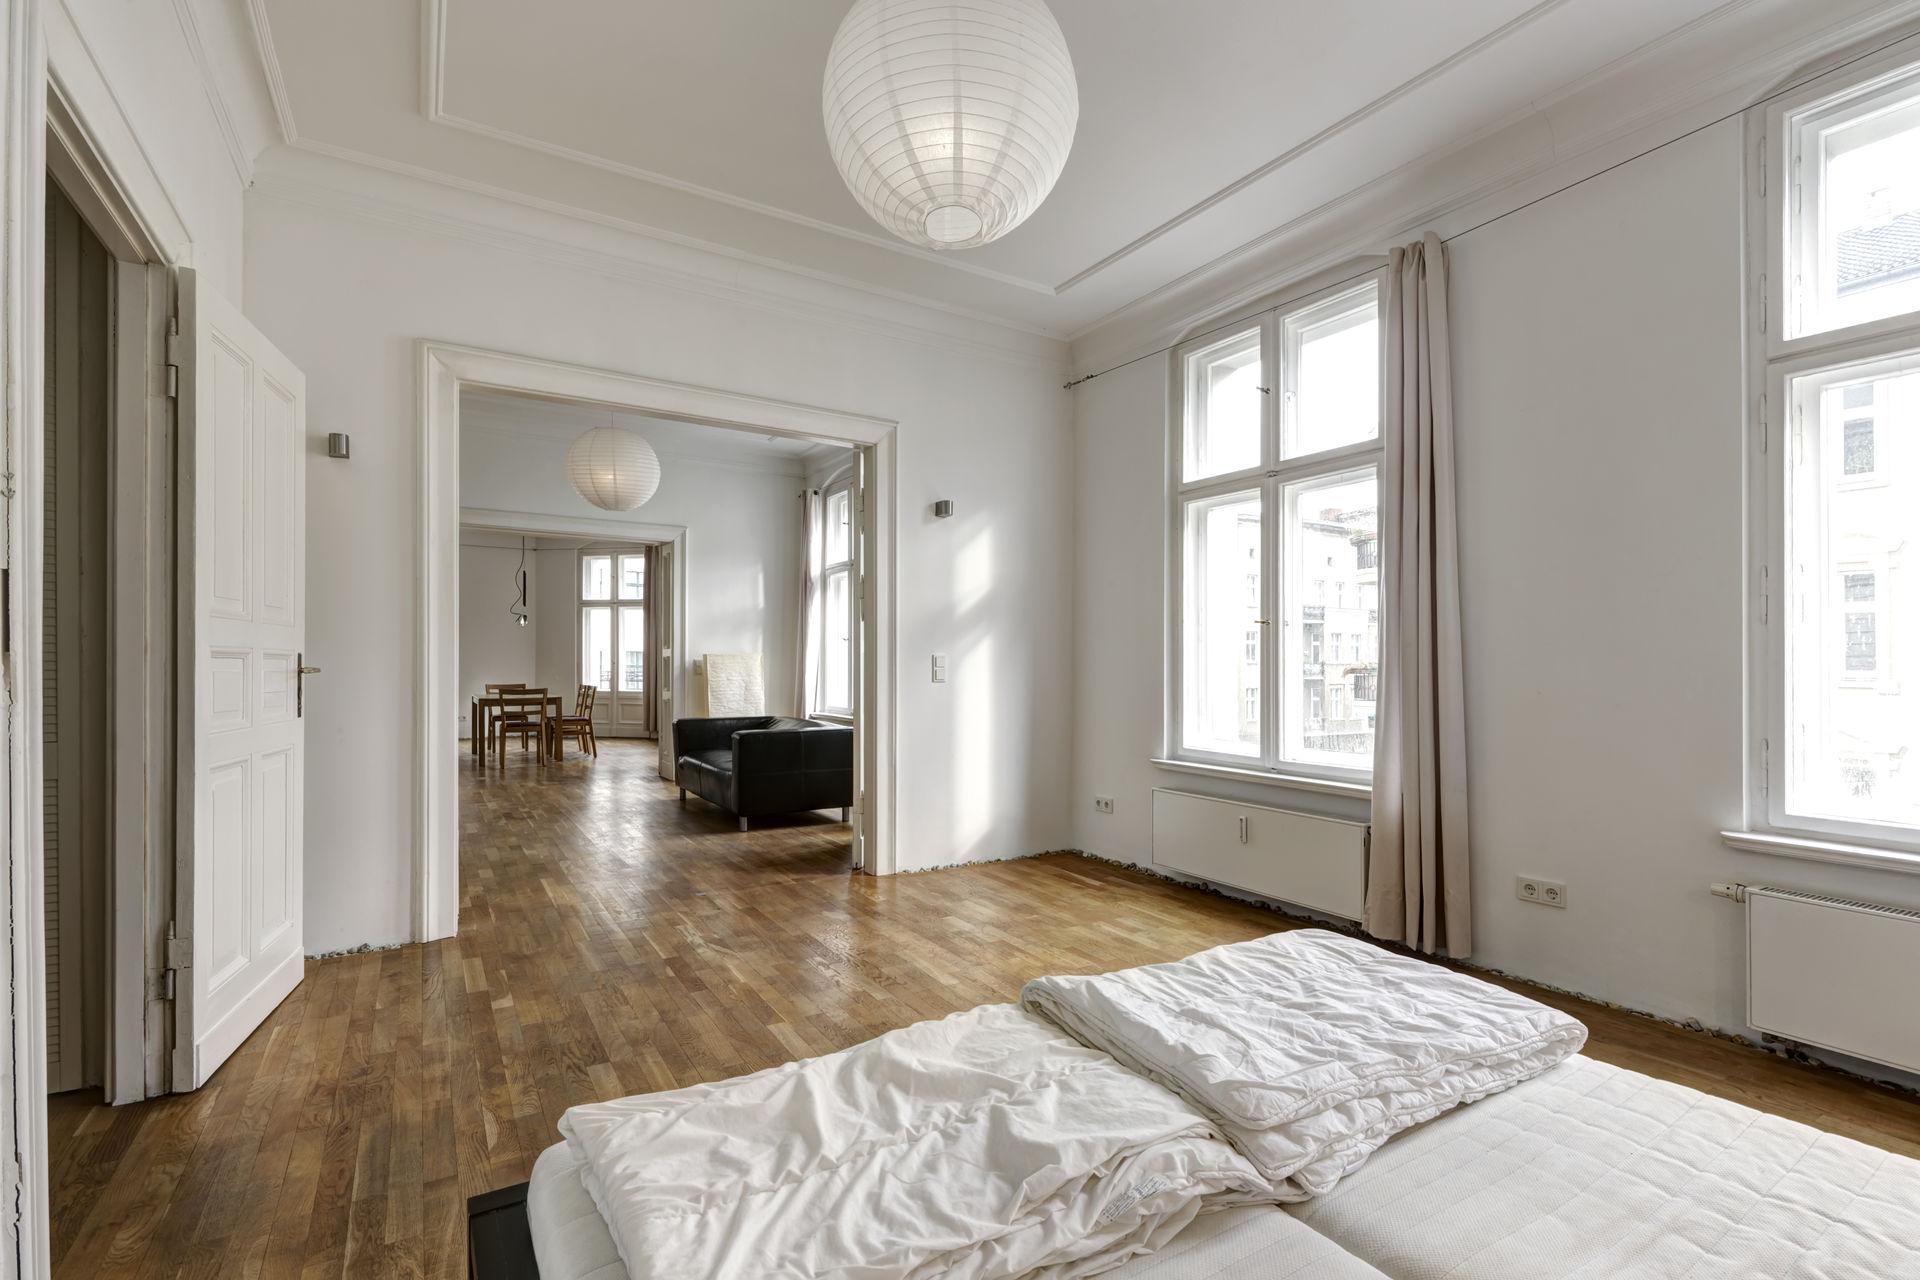 elegante altbauwohnung mit balkon im bergmannkiez farawayhome. Black Bedroom Furniture Sets. Home Design Ideas